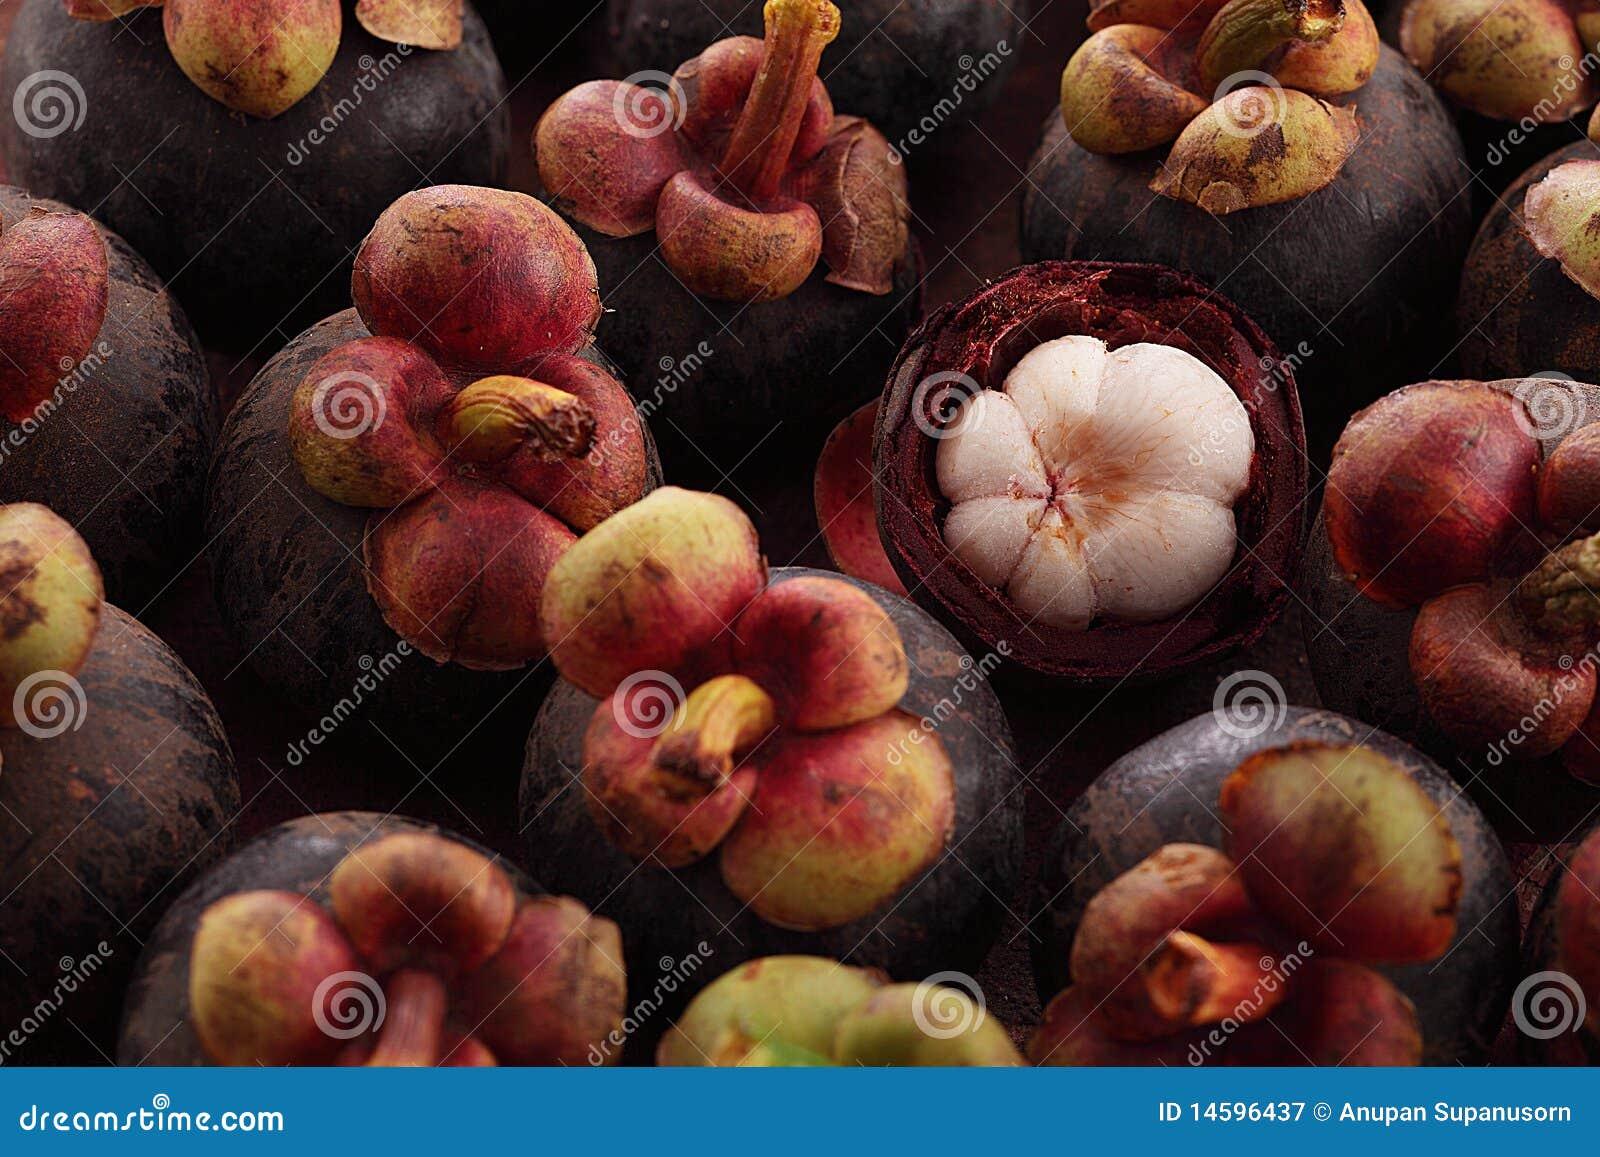 Mangostanfruchtmasse